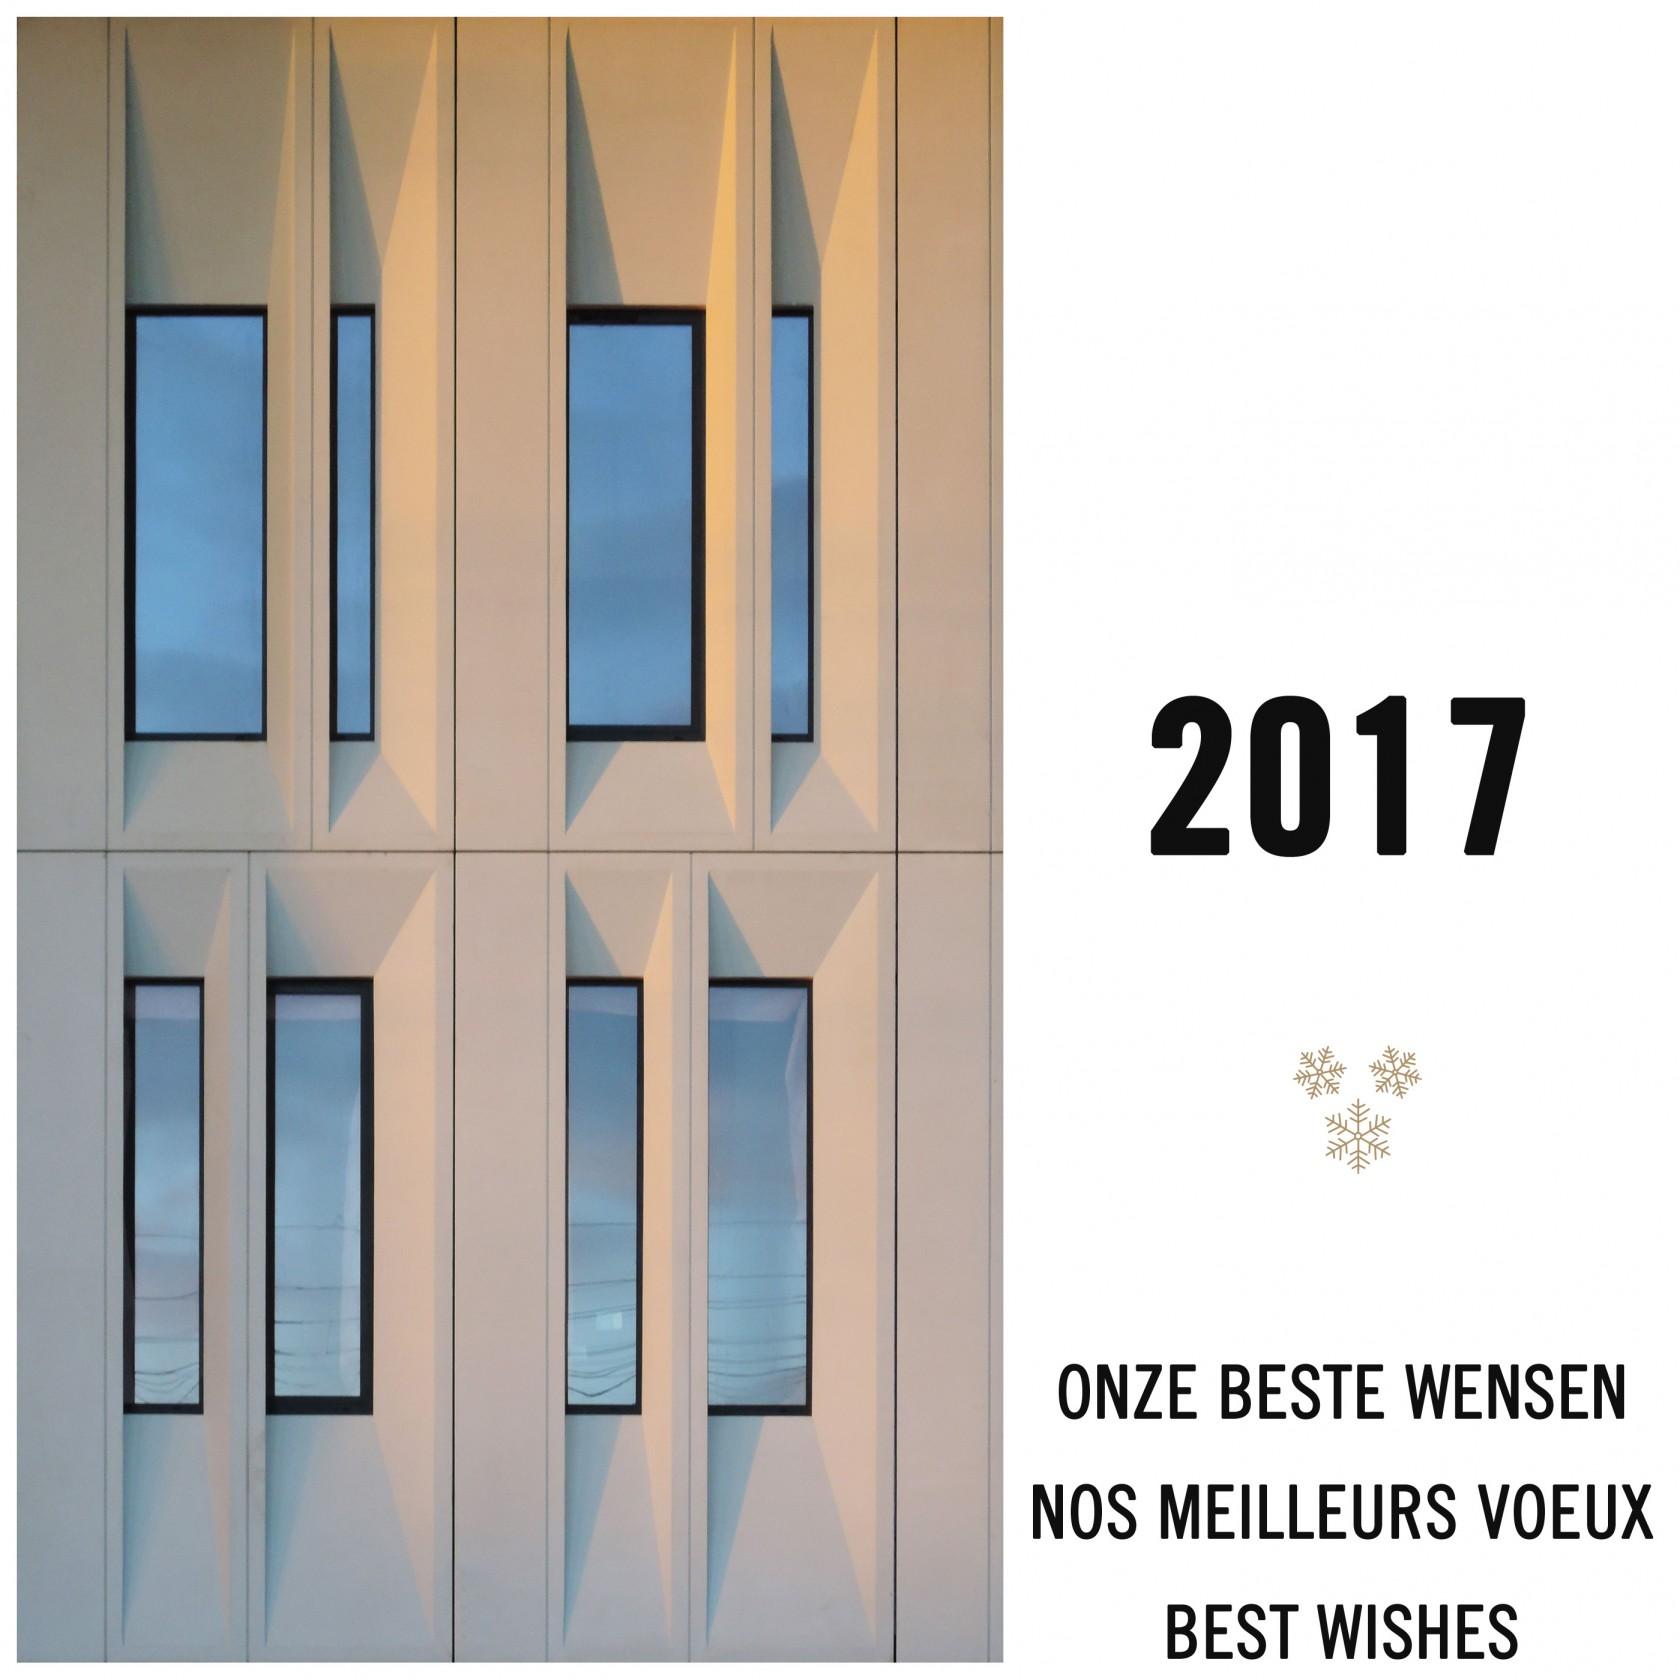 Abscis Architecten - PRETTIGE FEESTEN!